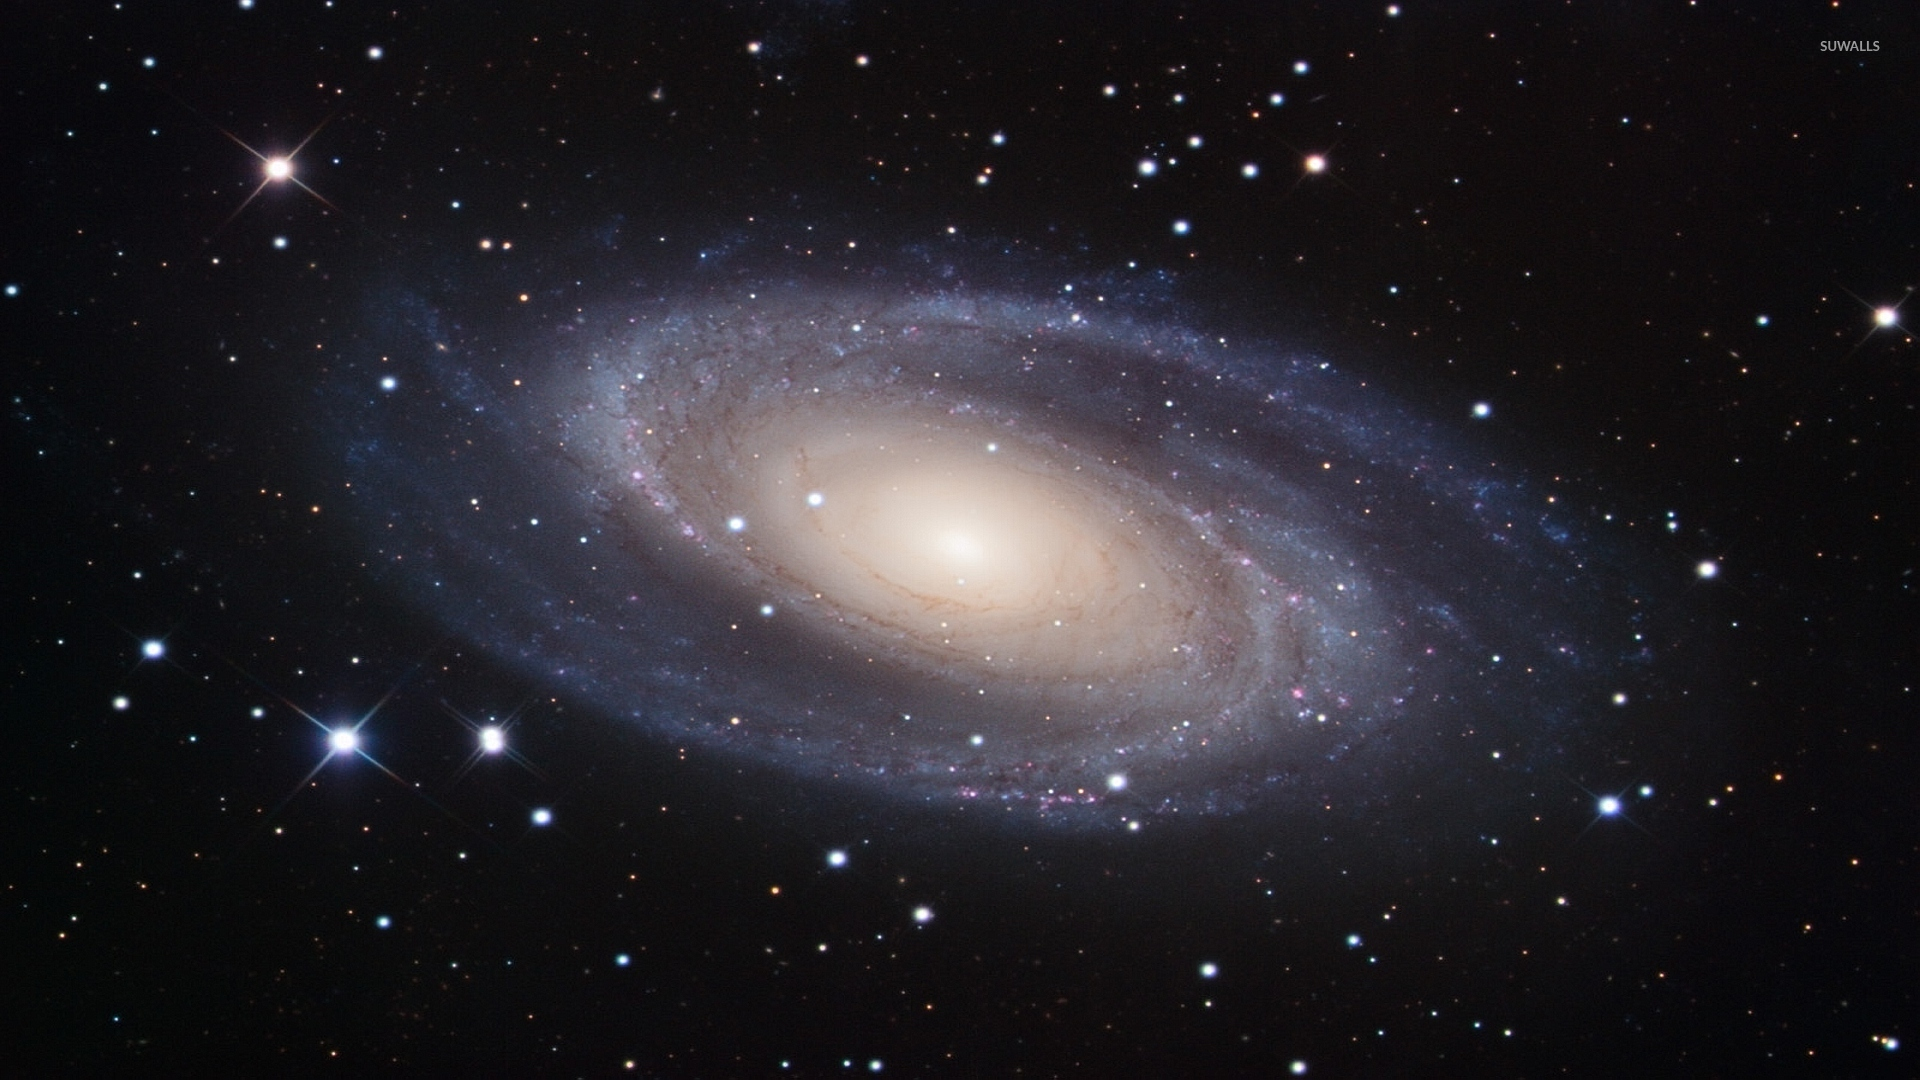 Messier 81 Spiral Galaxy wallpaper   Space wallpapers   1685 1920x1080